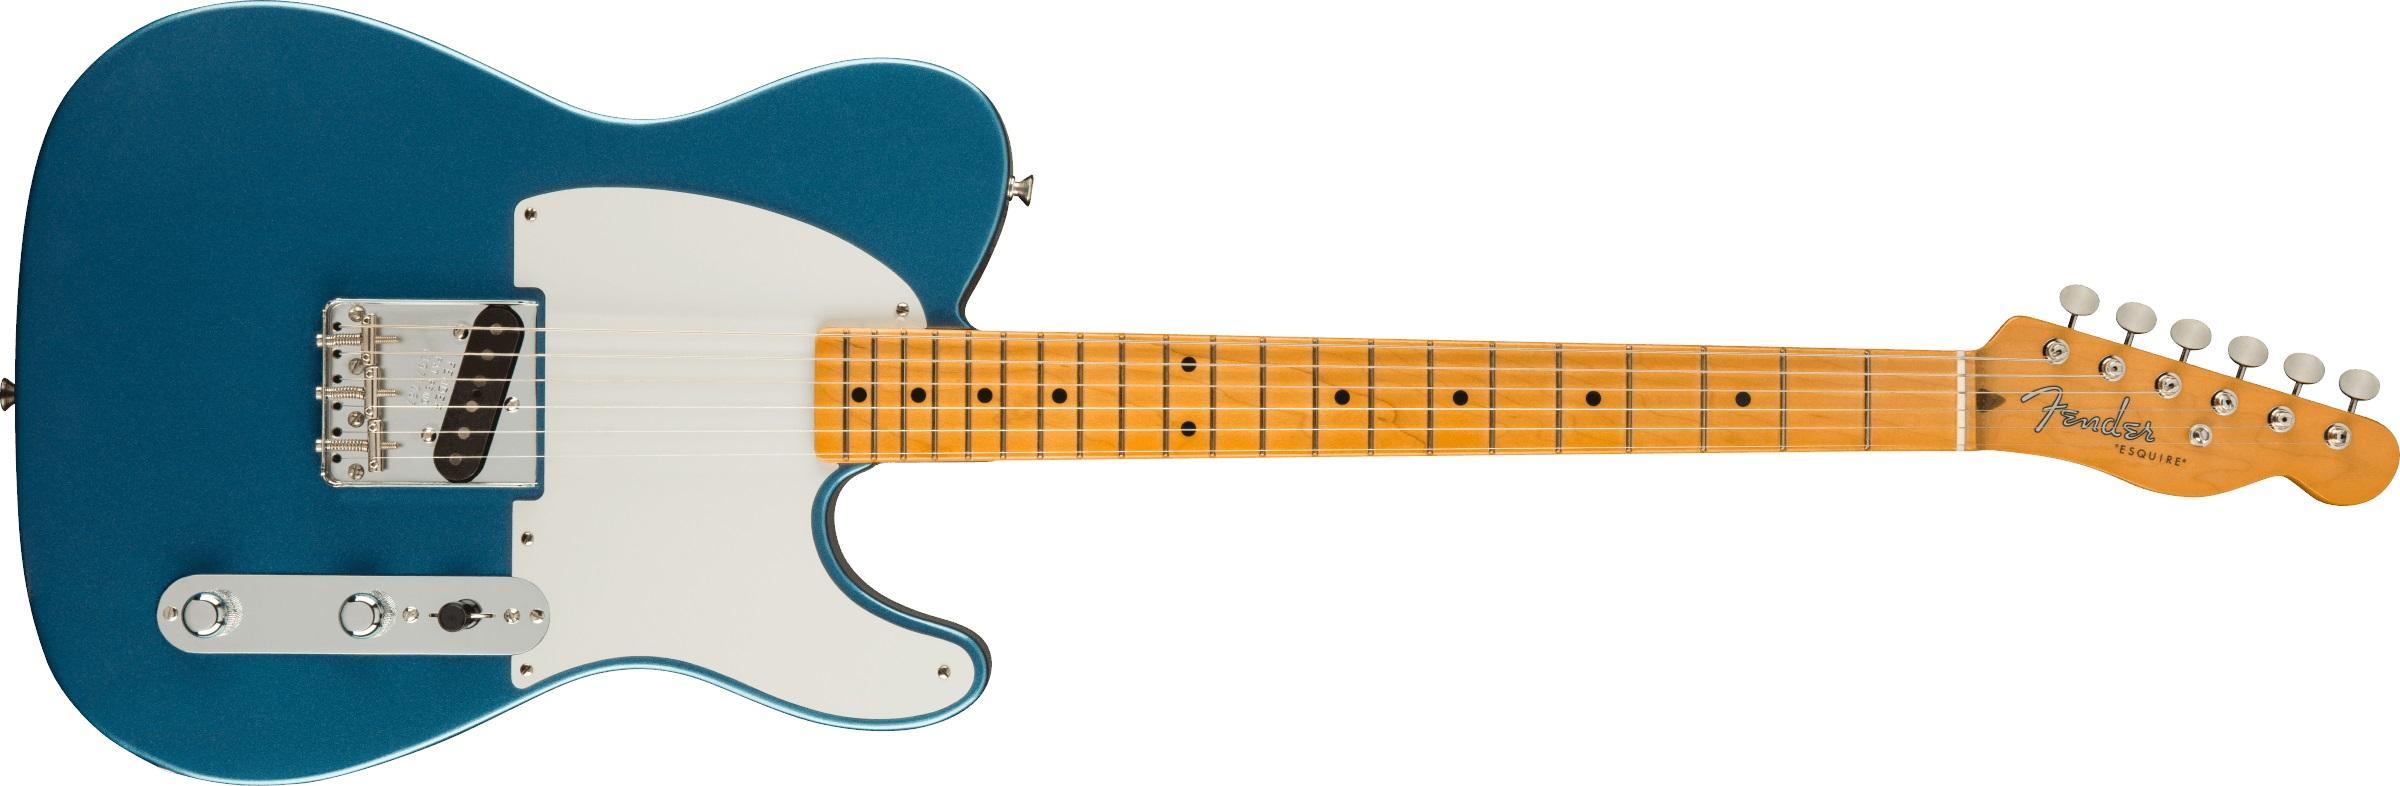 Fender 70th Anniversary Esquire MN LPB